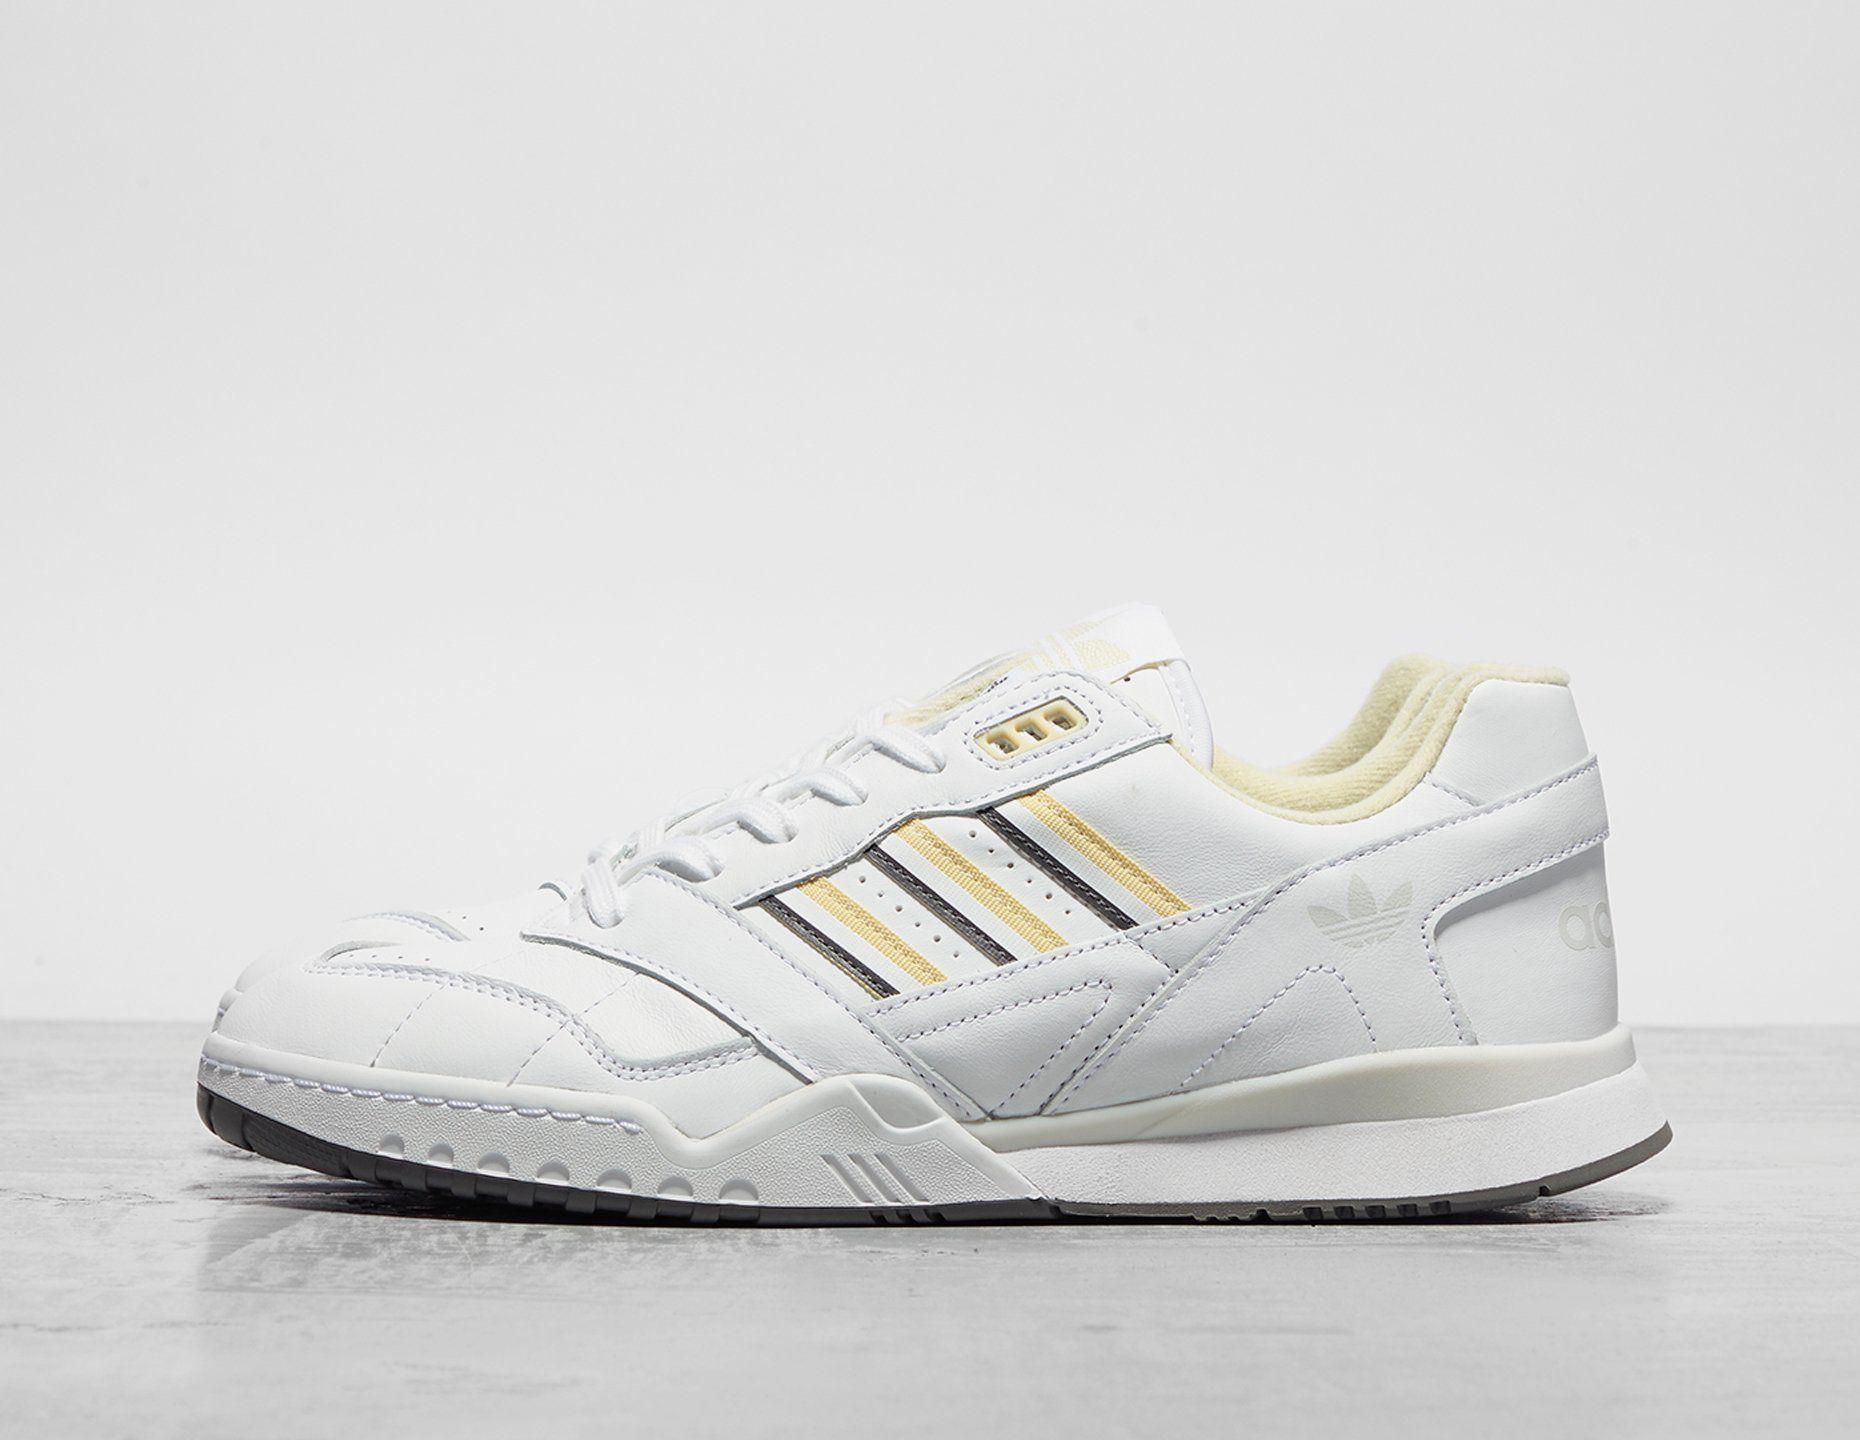 adidas Originals A.R. Trainer